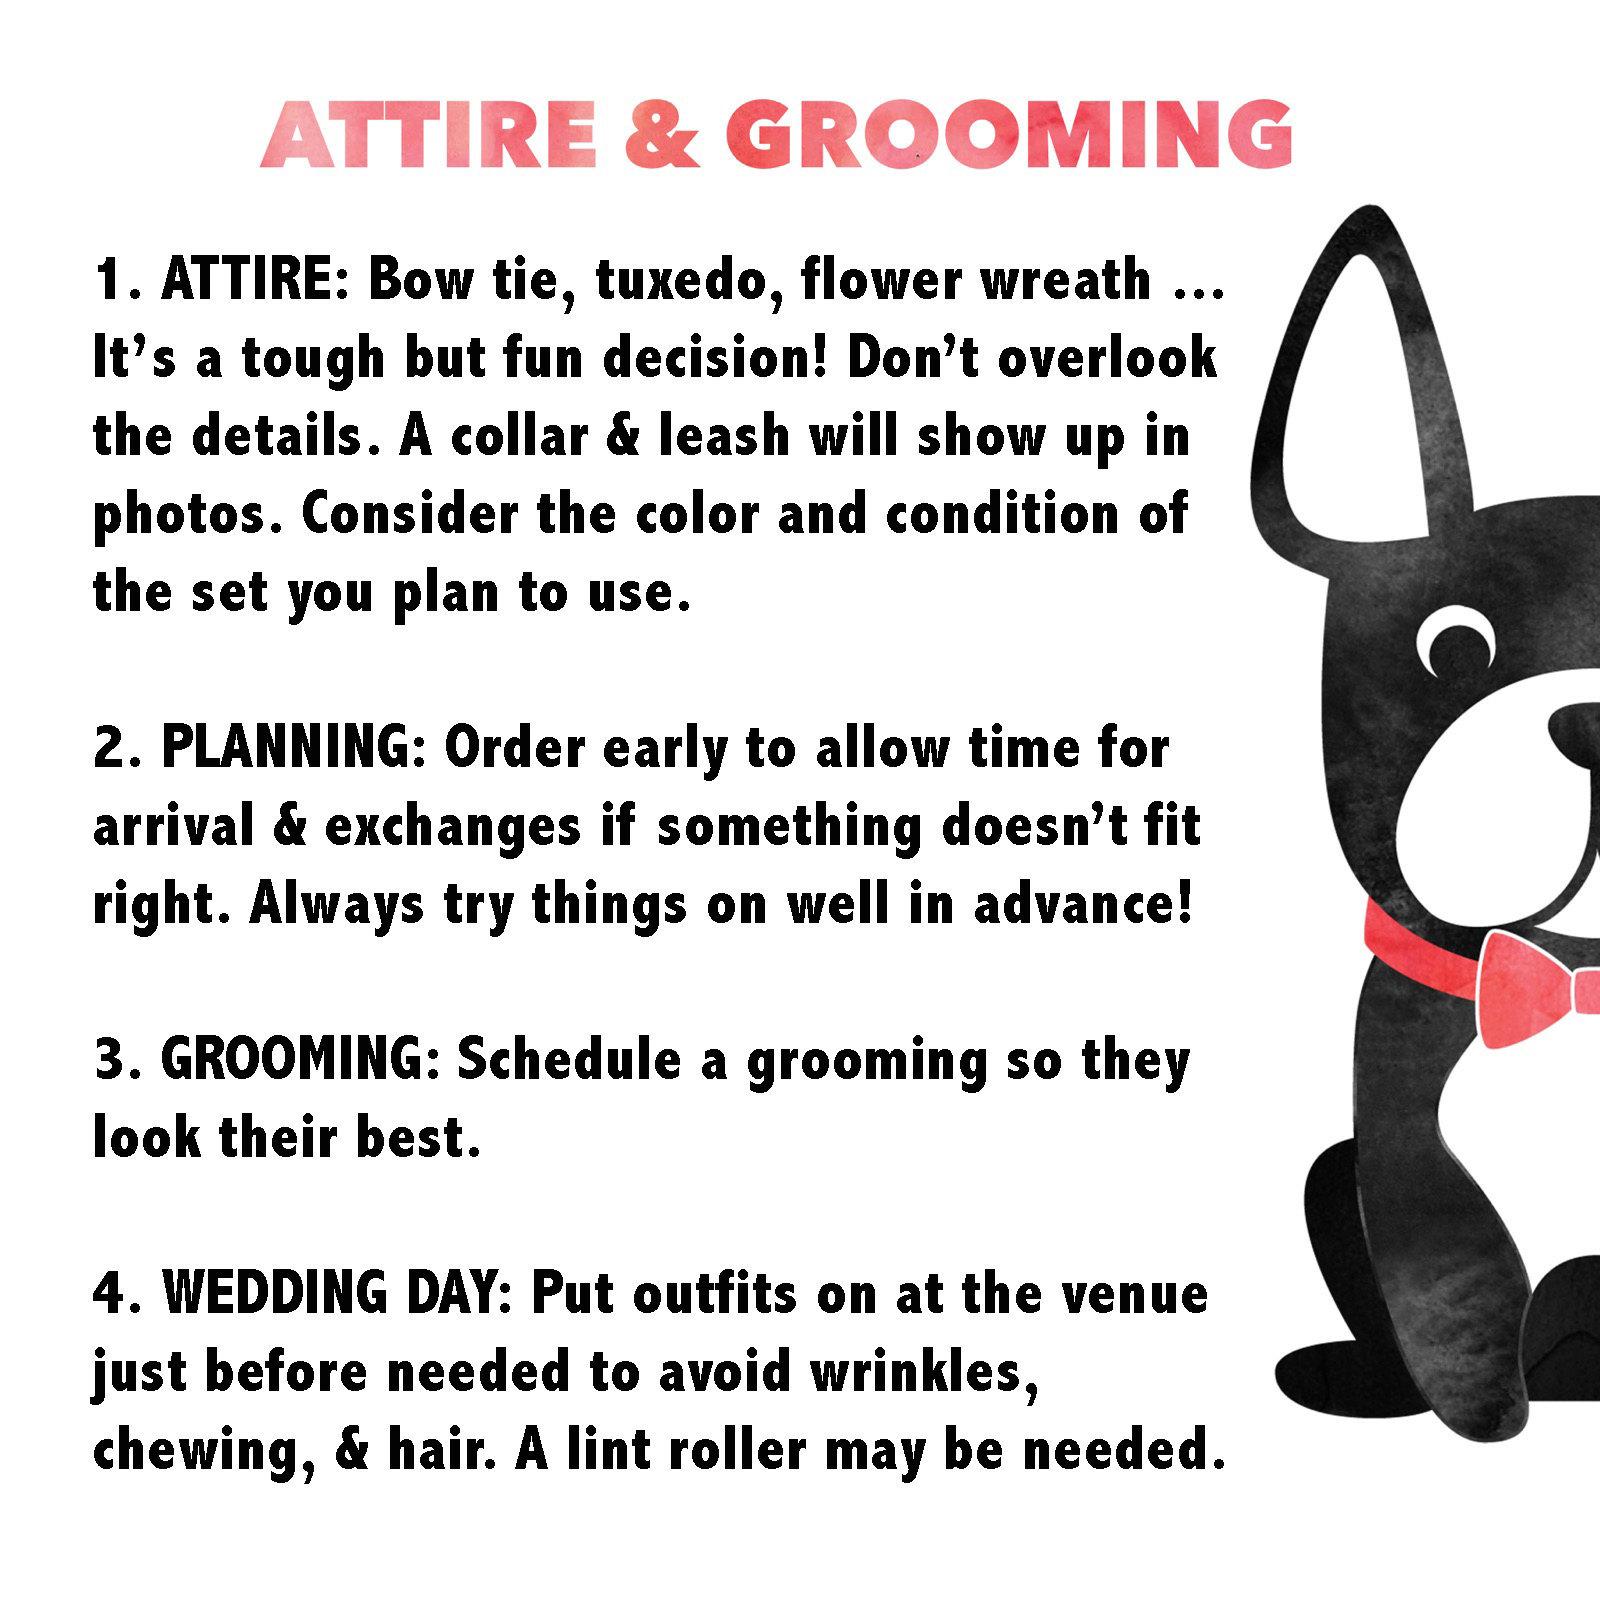 Attire & Grooming